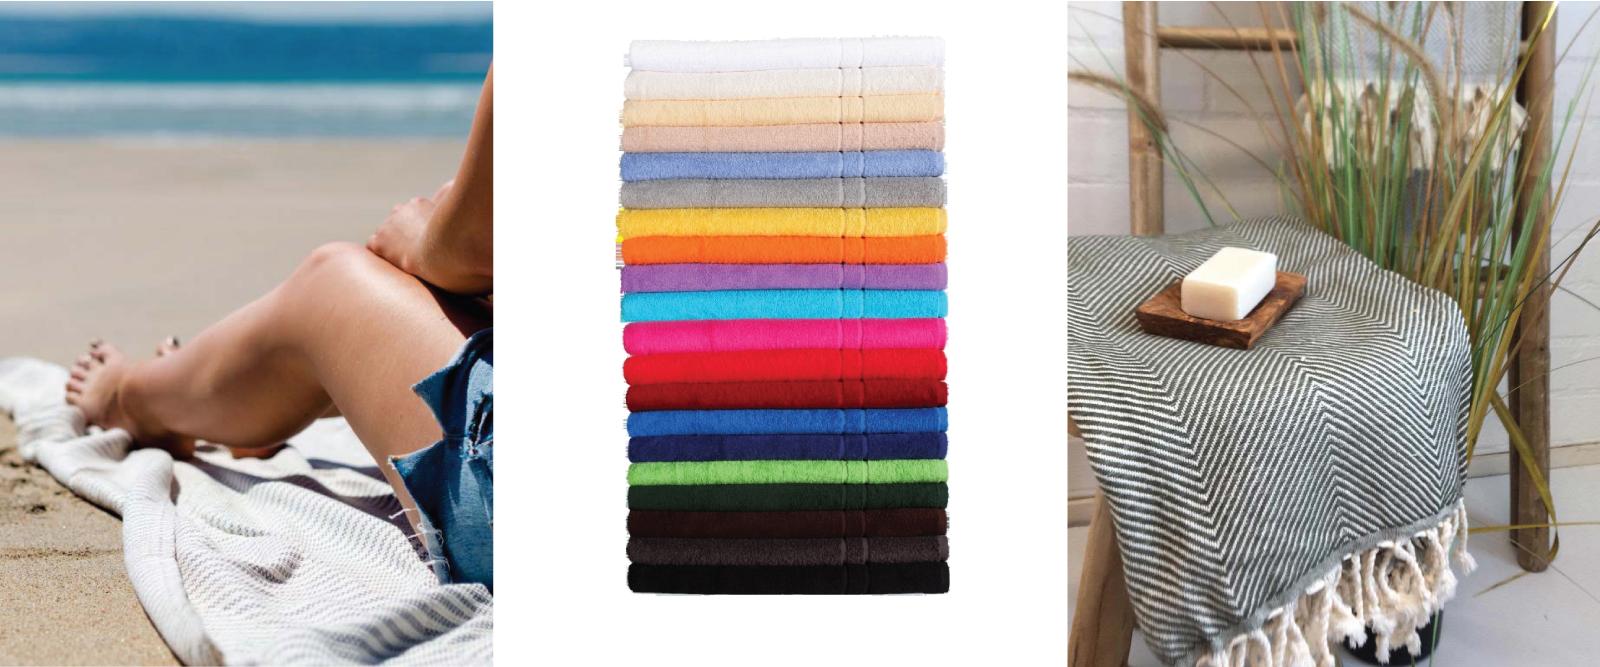 Sissekootud logoga saunalina, hammam-rätik, mikrofiiberrätik